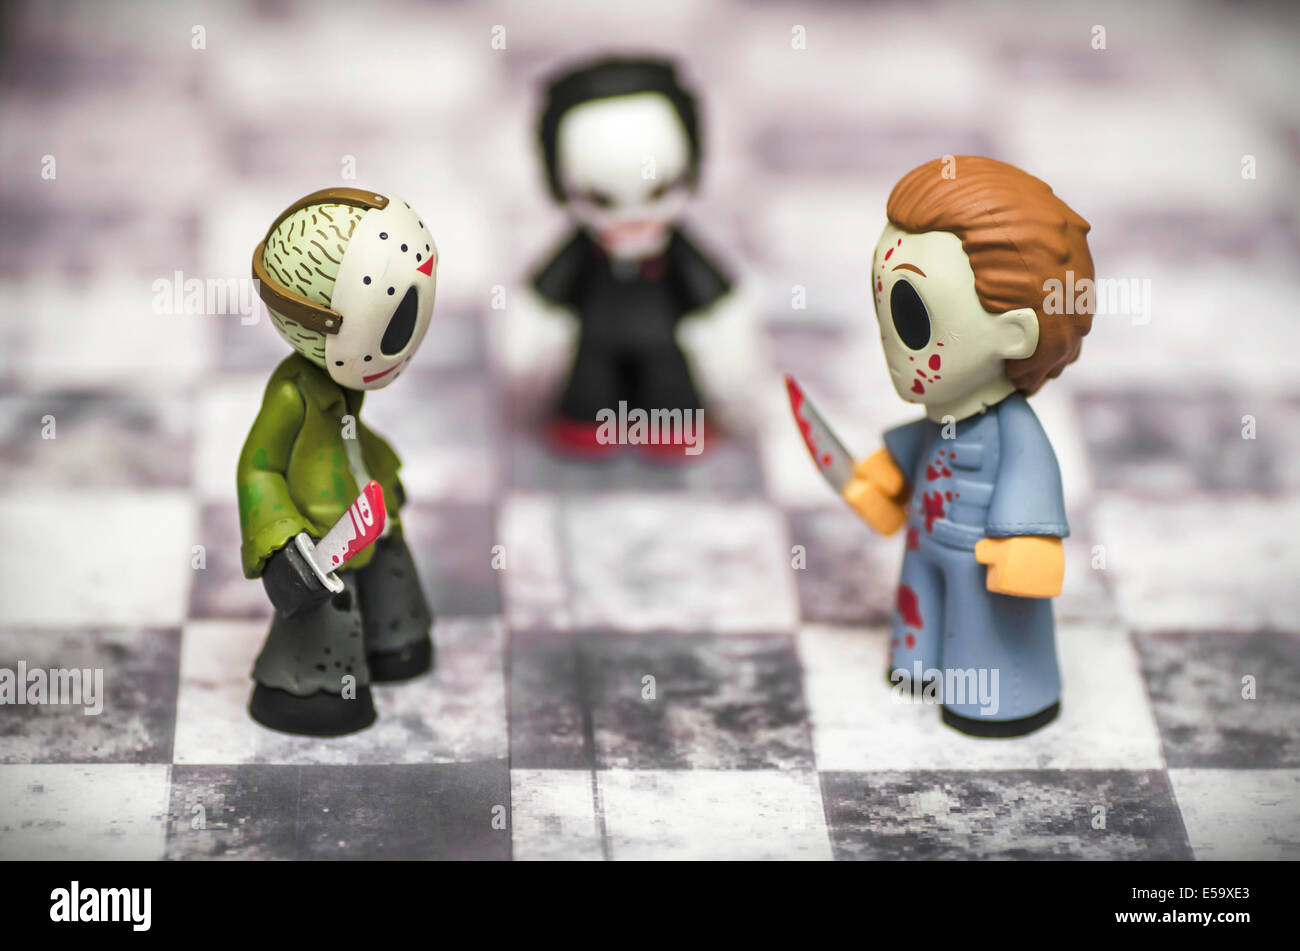 Les films d'horreur Jeu d'Funny Toys Banque D'Images